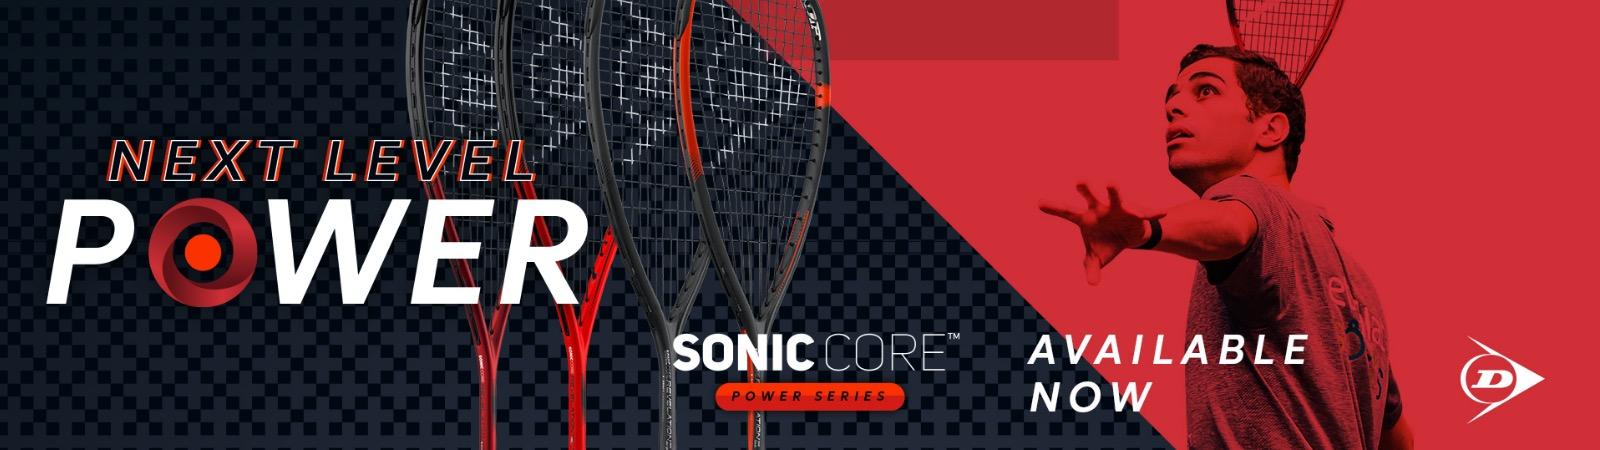 Dunlop SonicCore Next Level Power